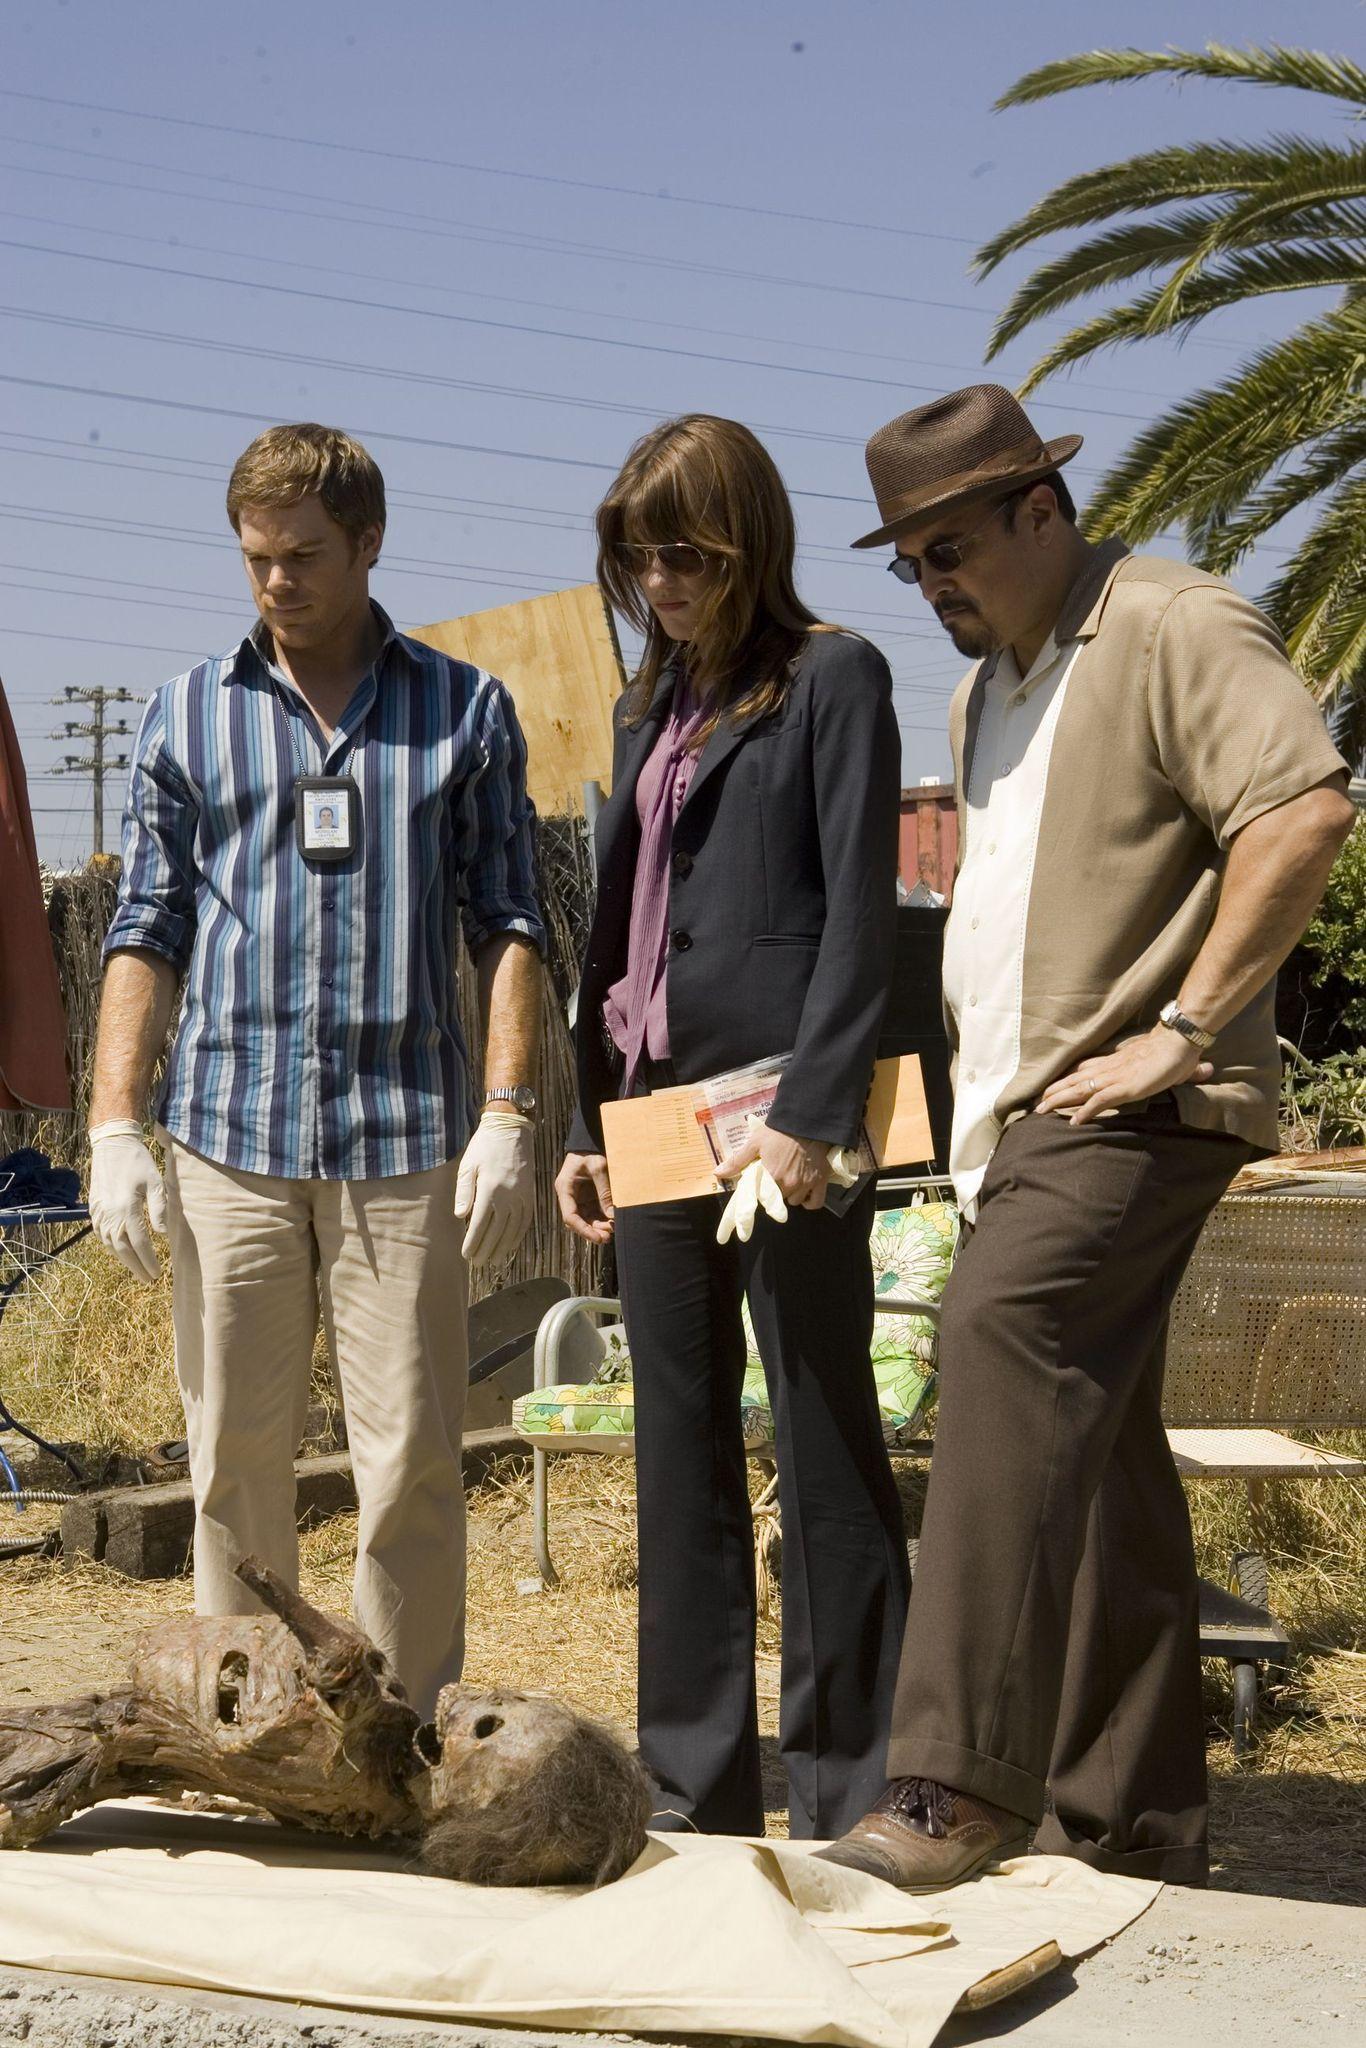 Dexter - Season 1 Episode 7 Still